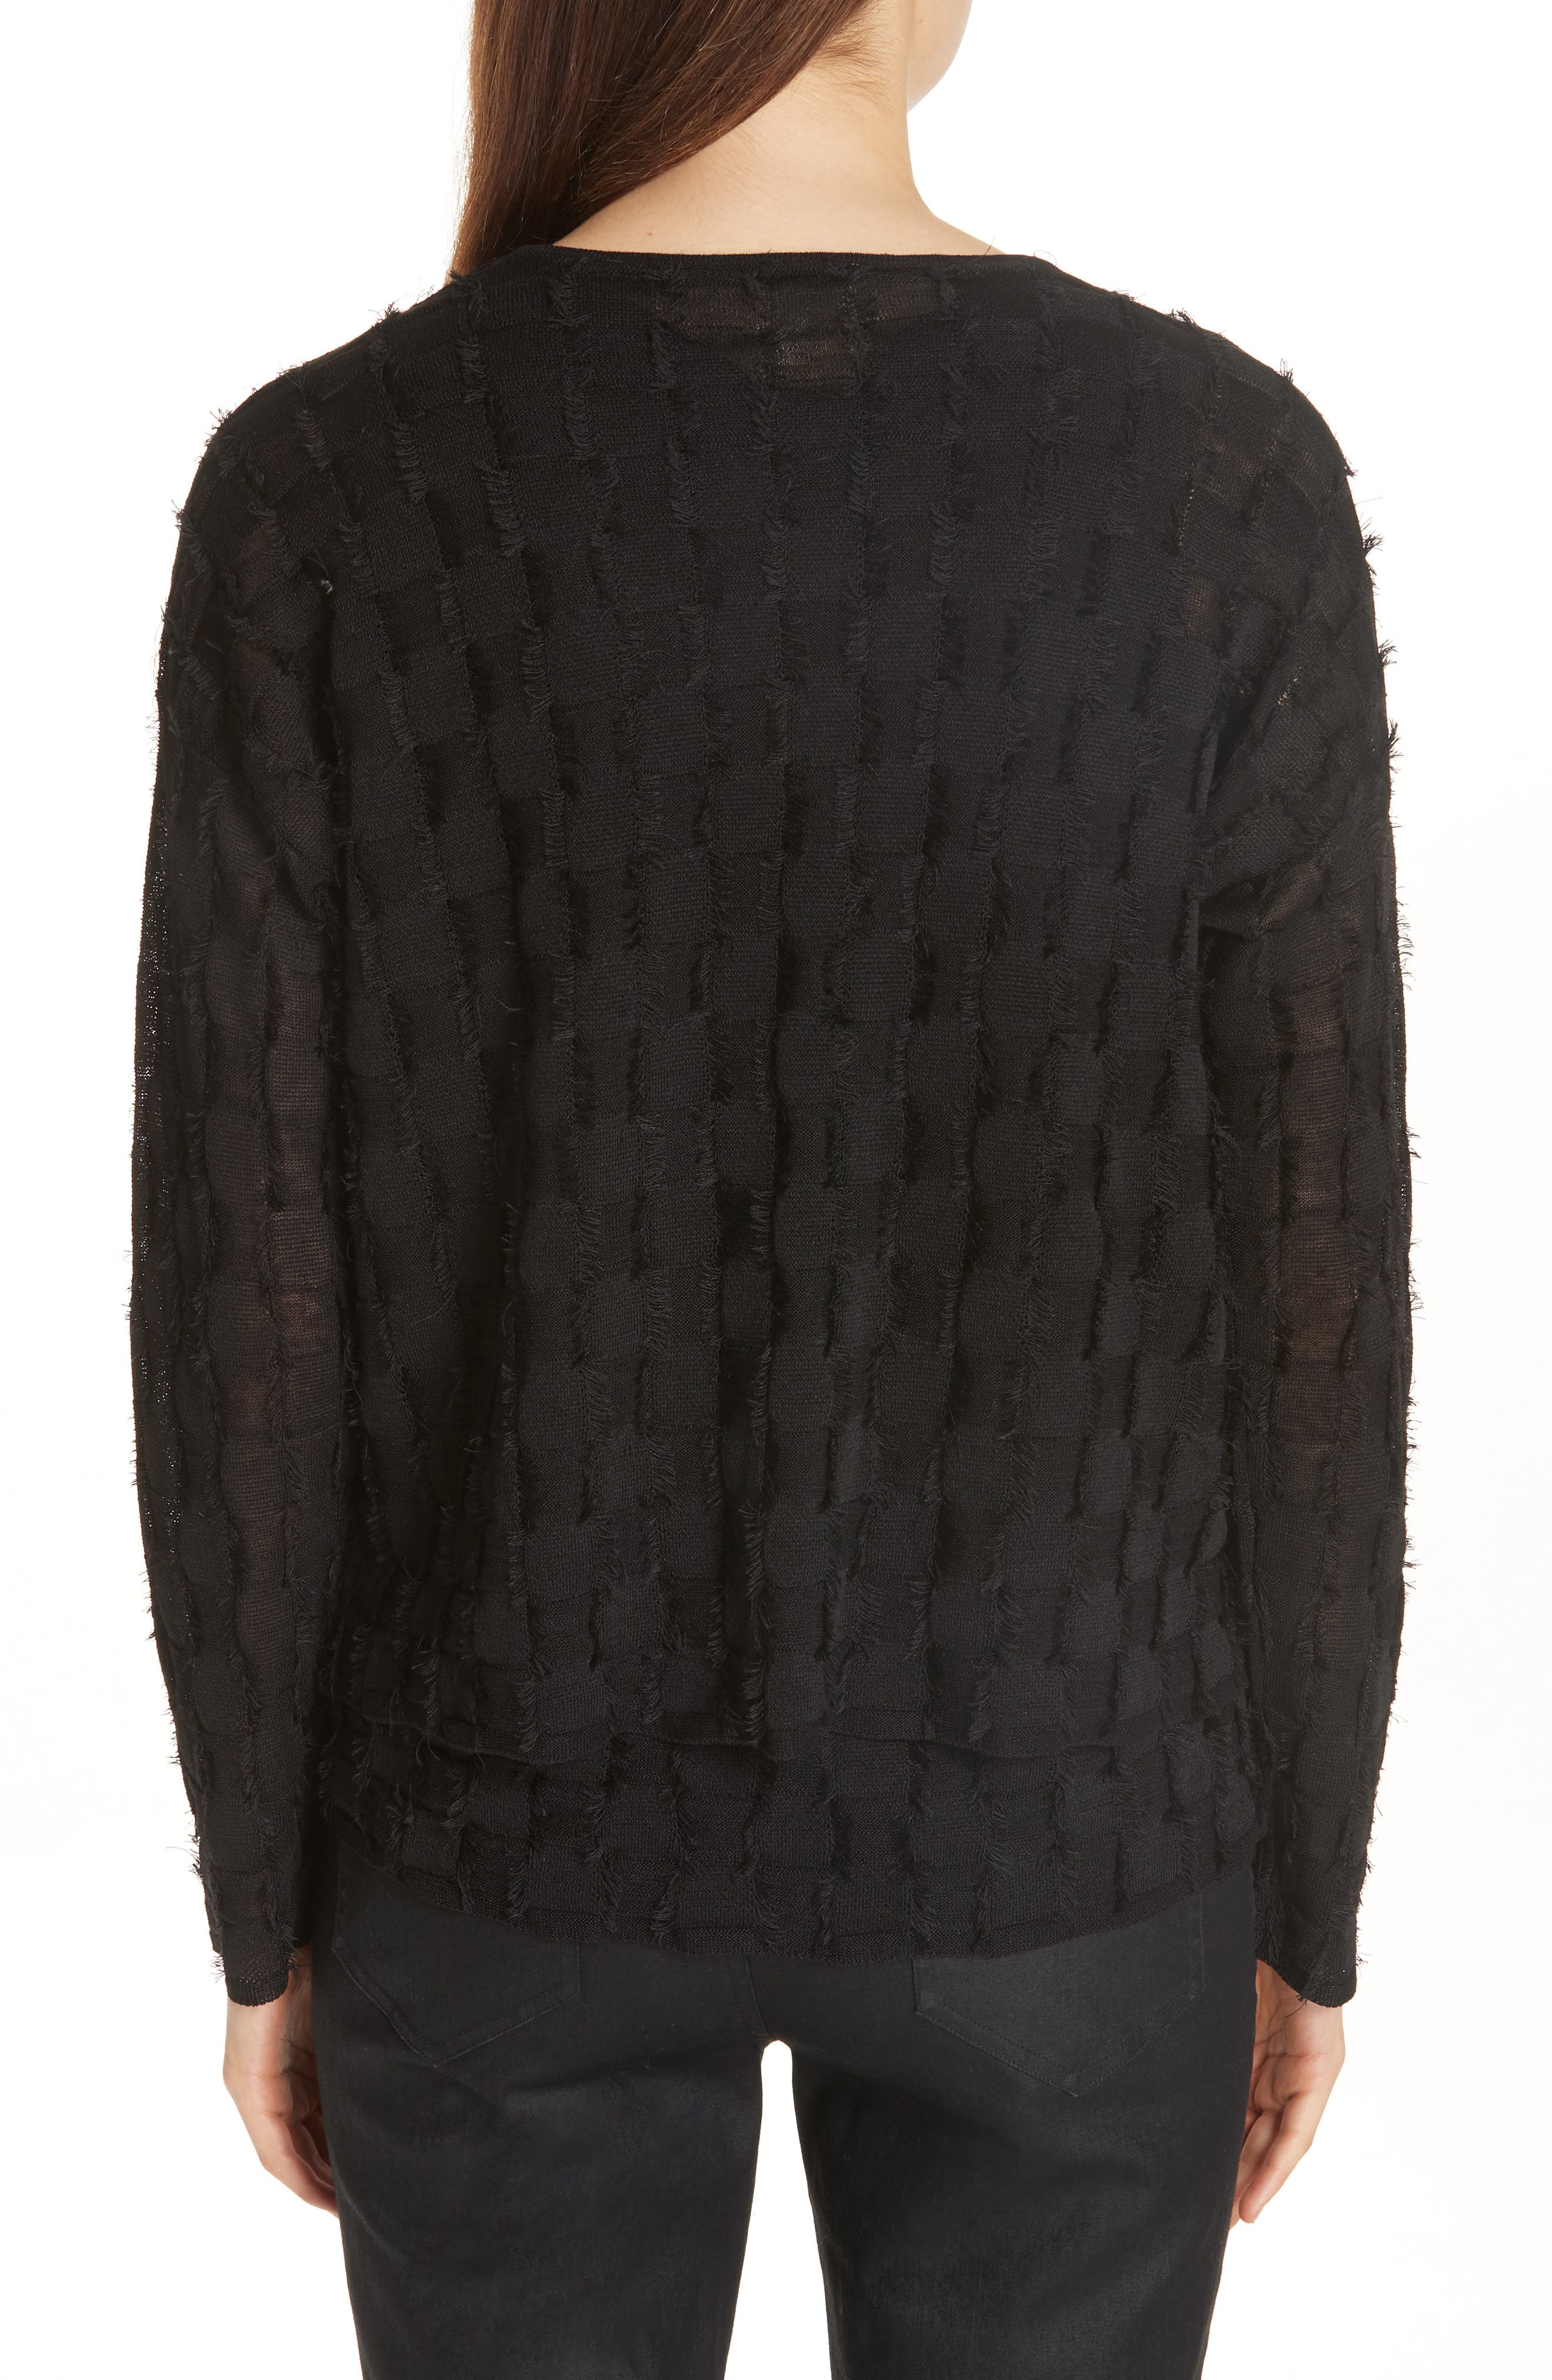 Fringe Knit Sweater,                             Alternate thumbnail 2, color,                             Black